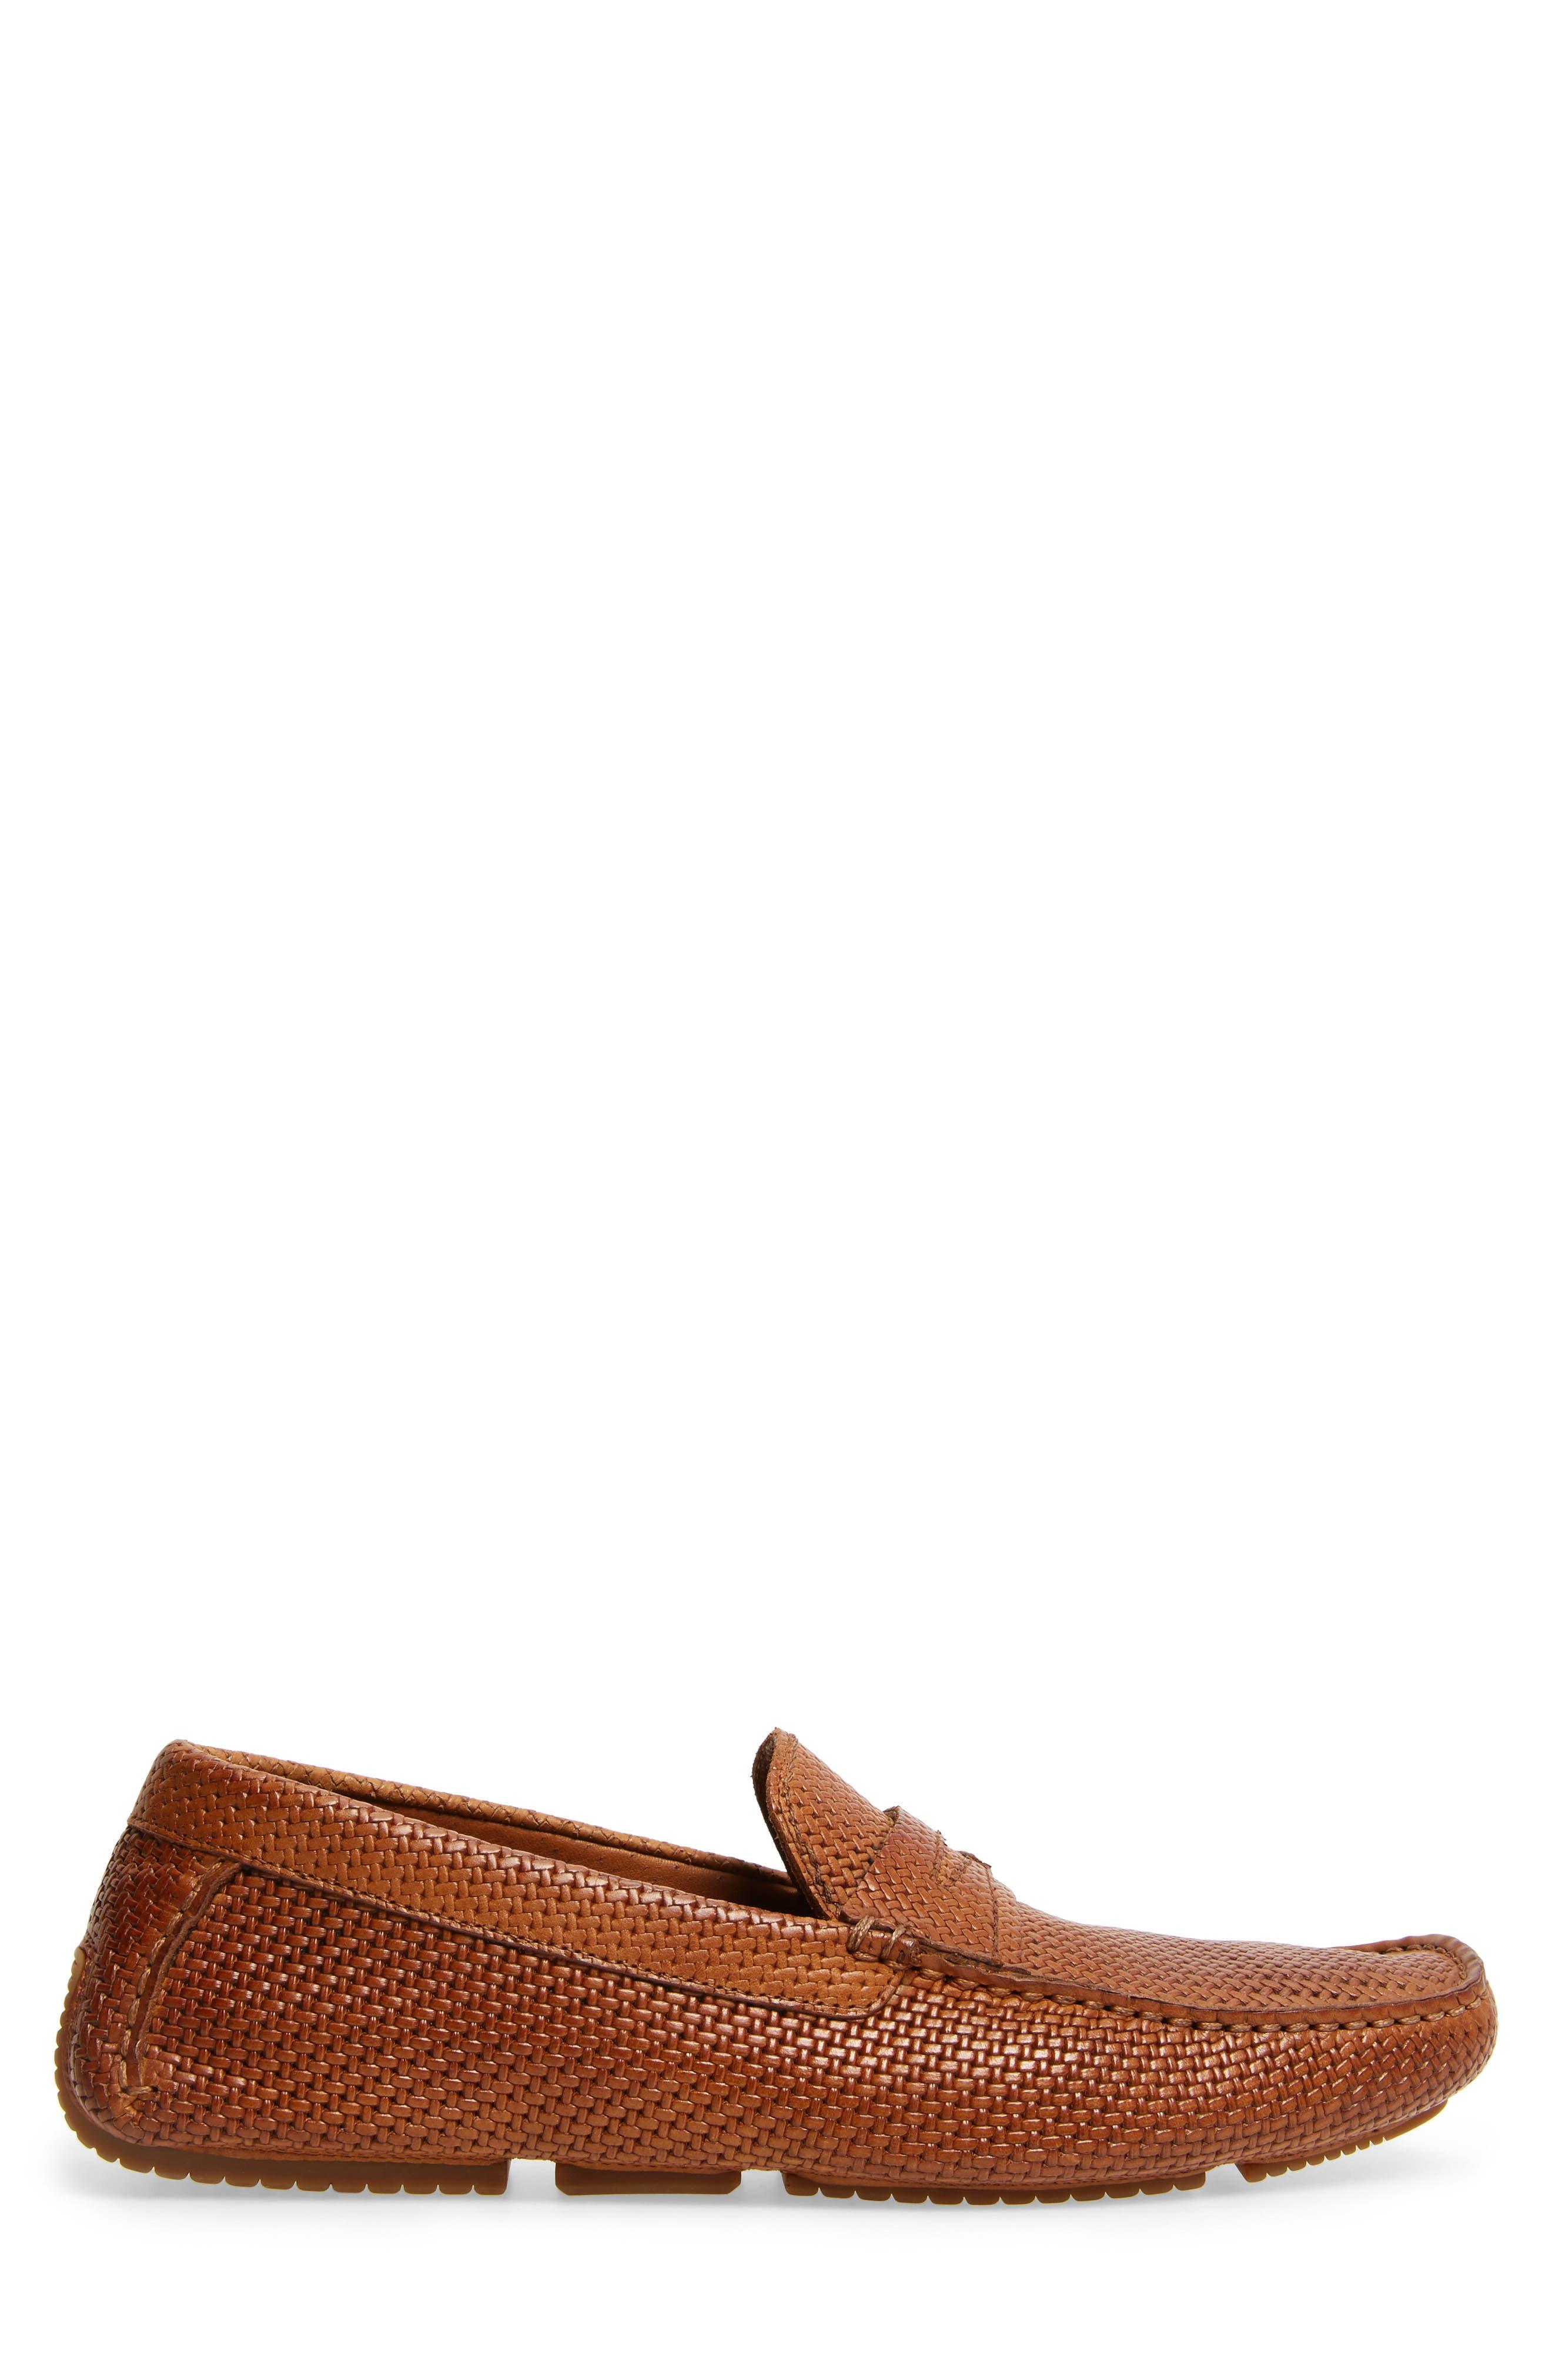 Brandon Weatherproof Driving Loafer,                             Alternate thumbnail 5, color,                             Cognac